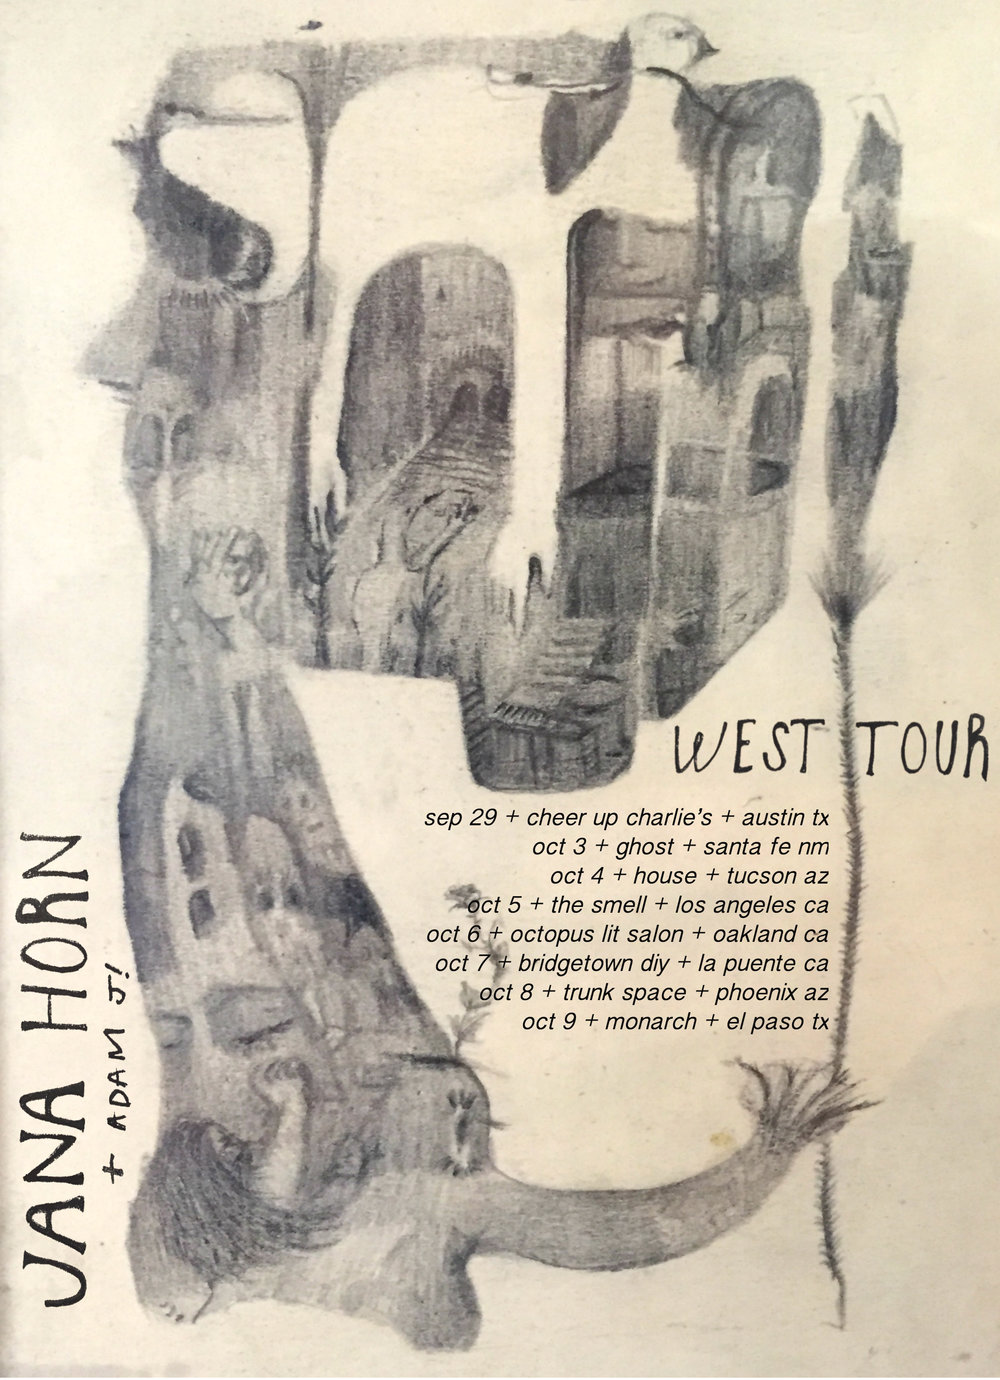 west tour poster.jpg